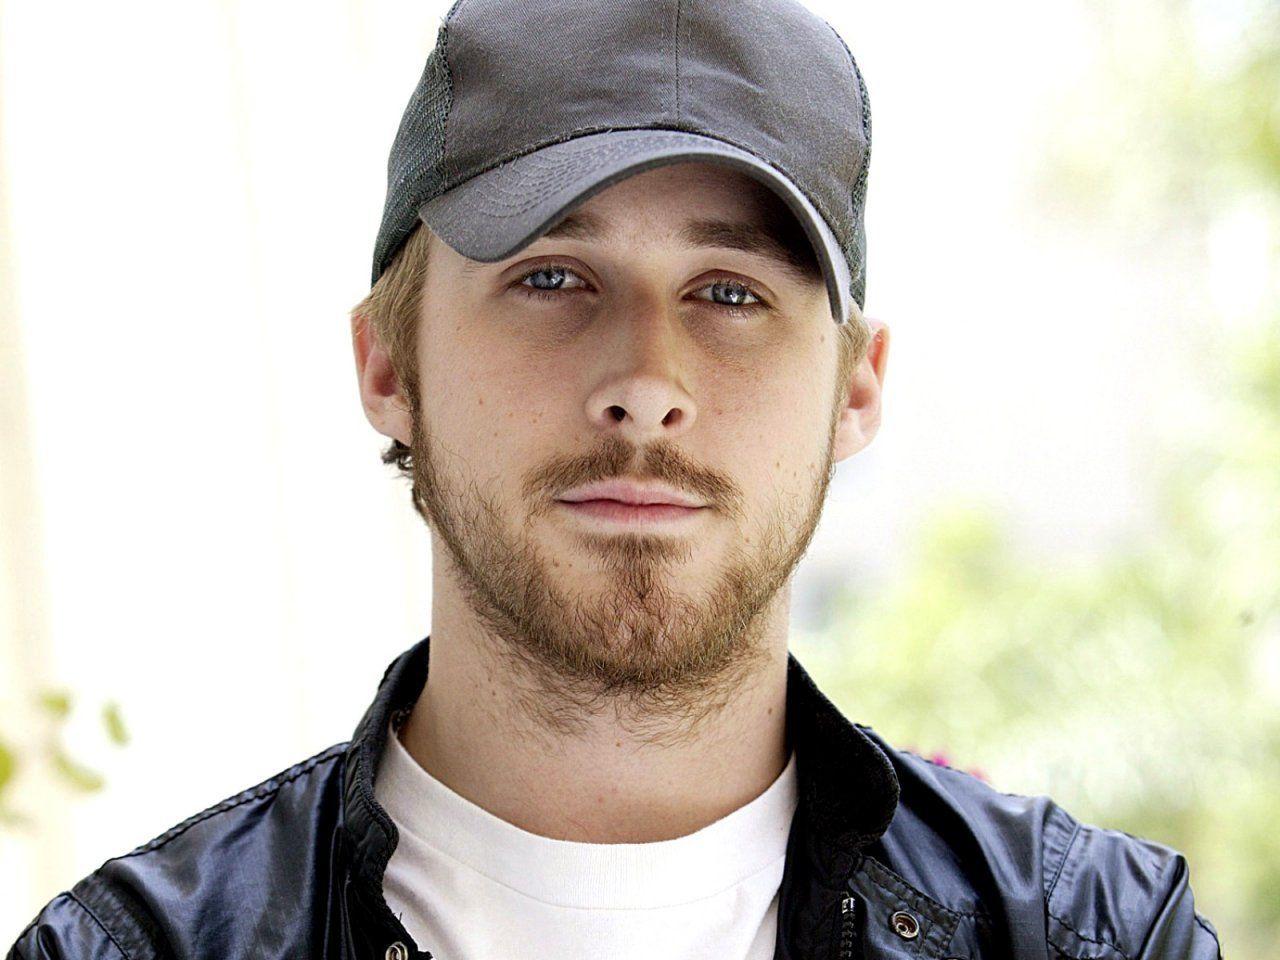 Ryan-Gosling-ryan-gosling-22881426-1280-960